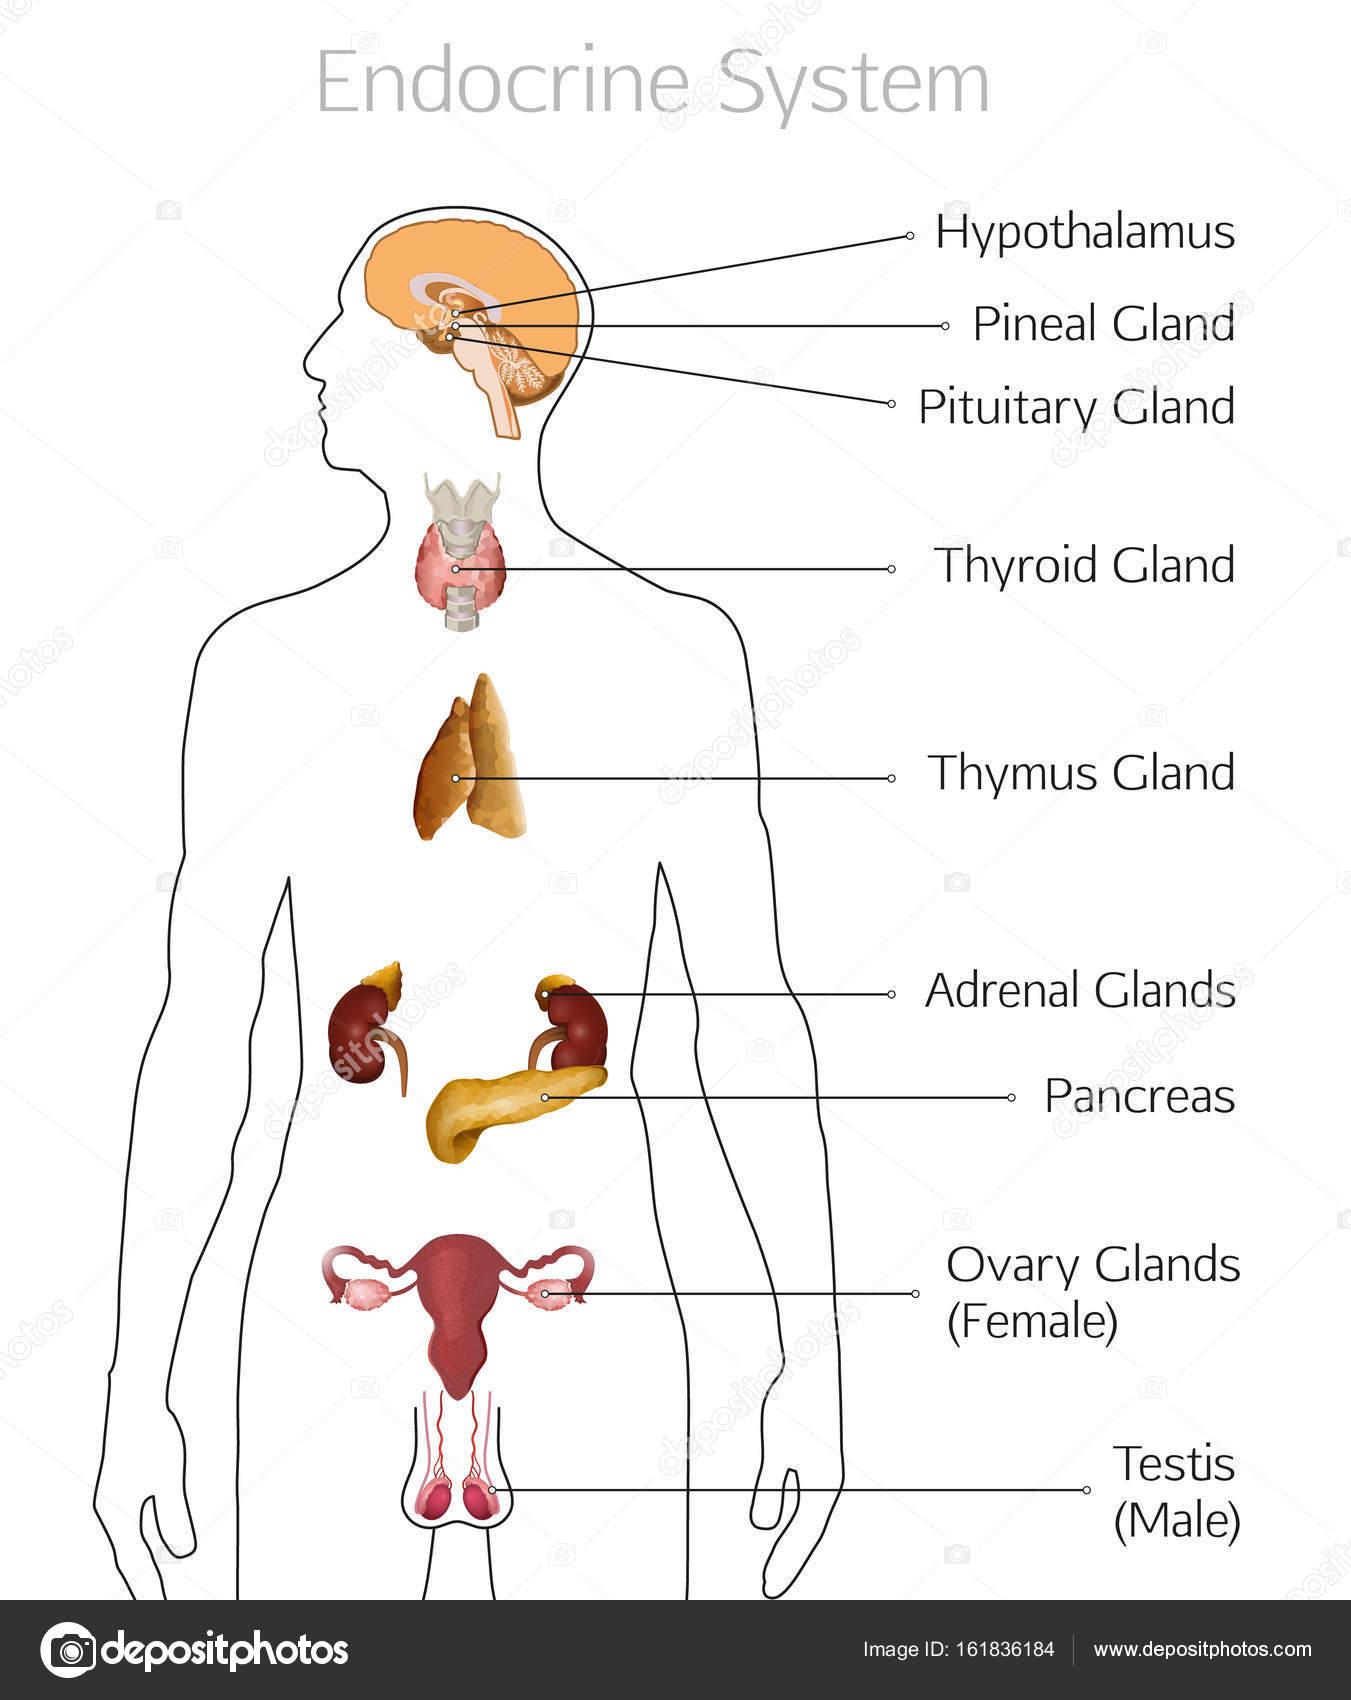 Endokrinen System-Image — Stockvektor © annyart #161836184